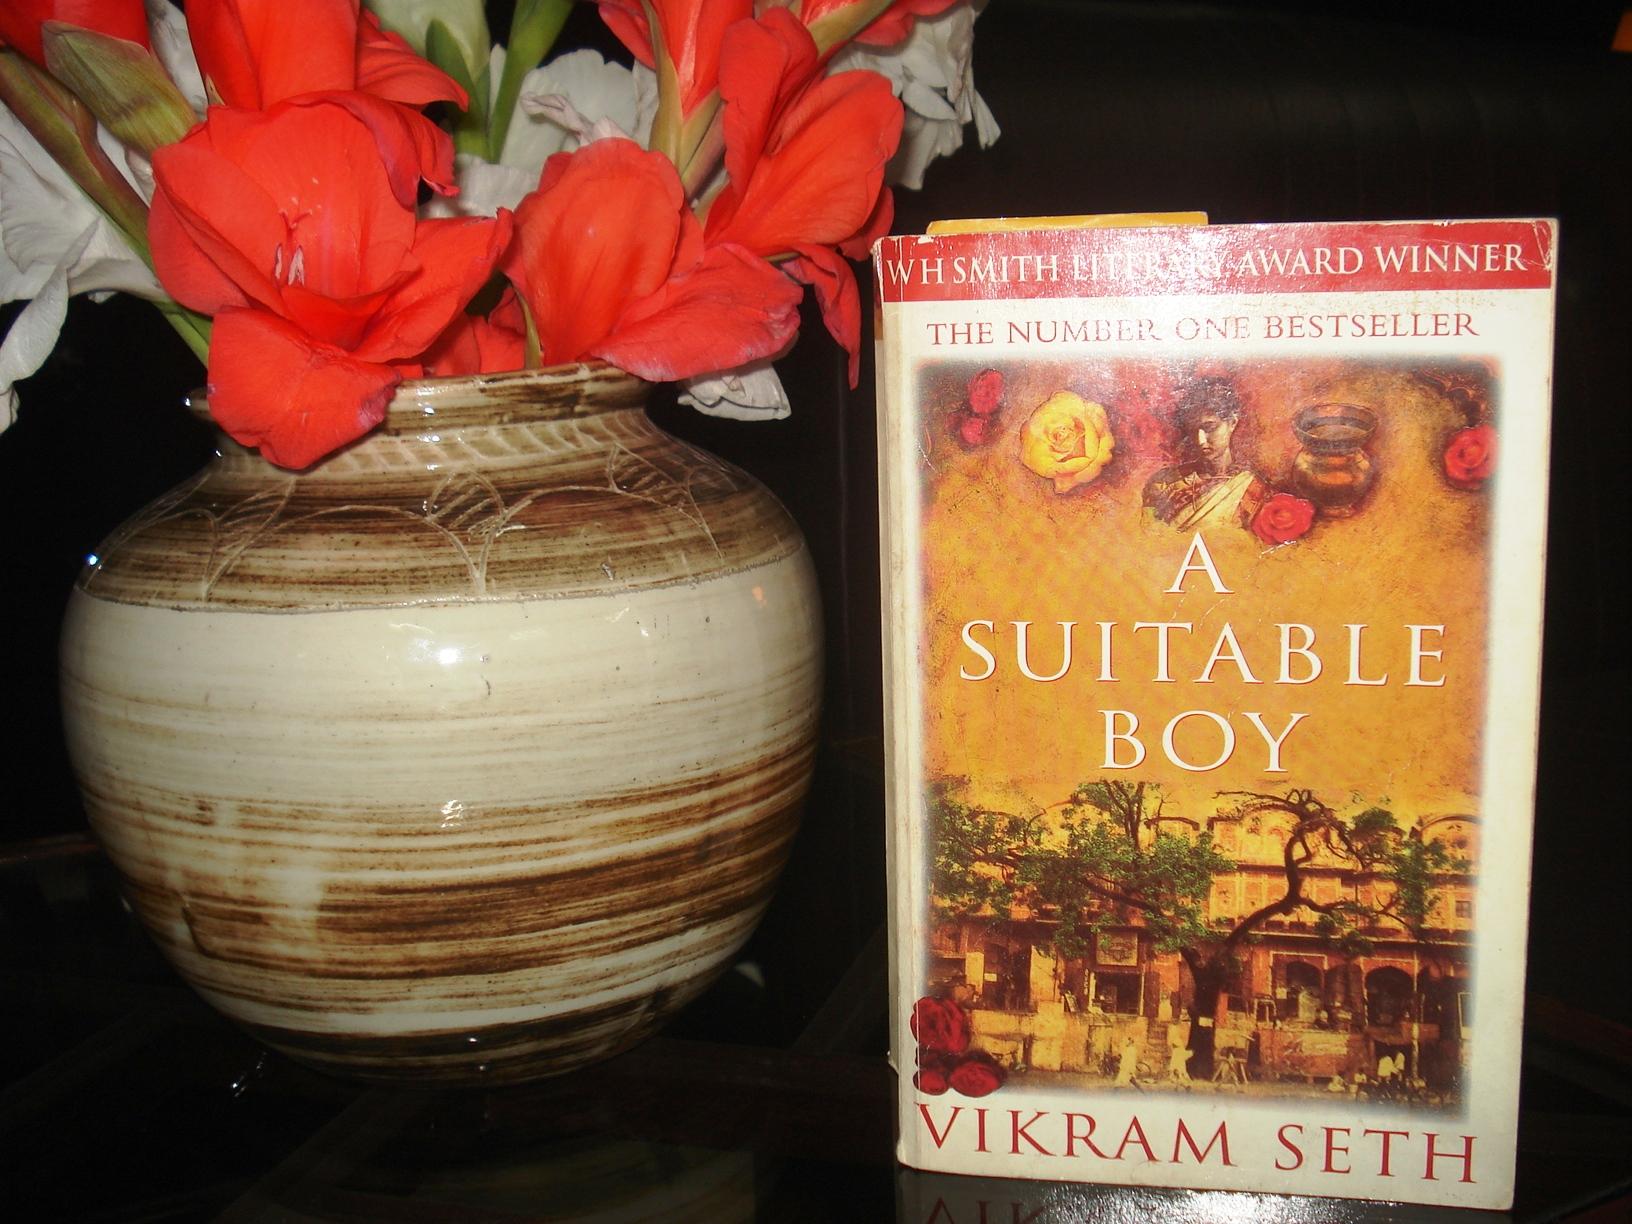 vikram seth book a suitable boy